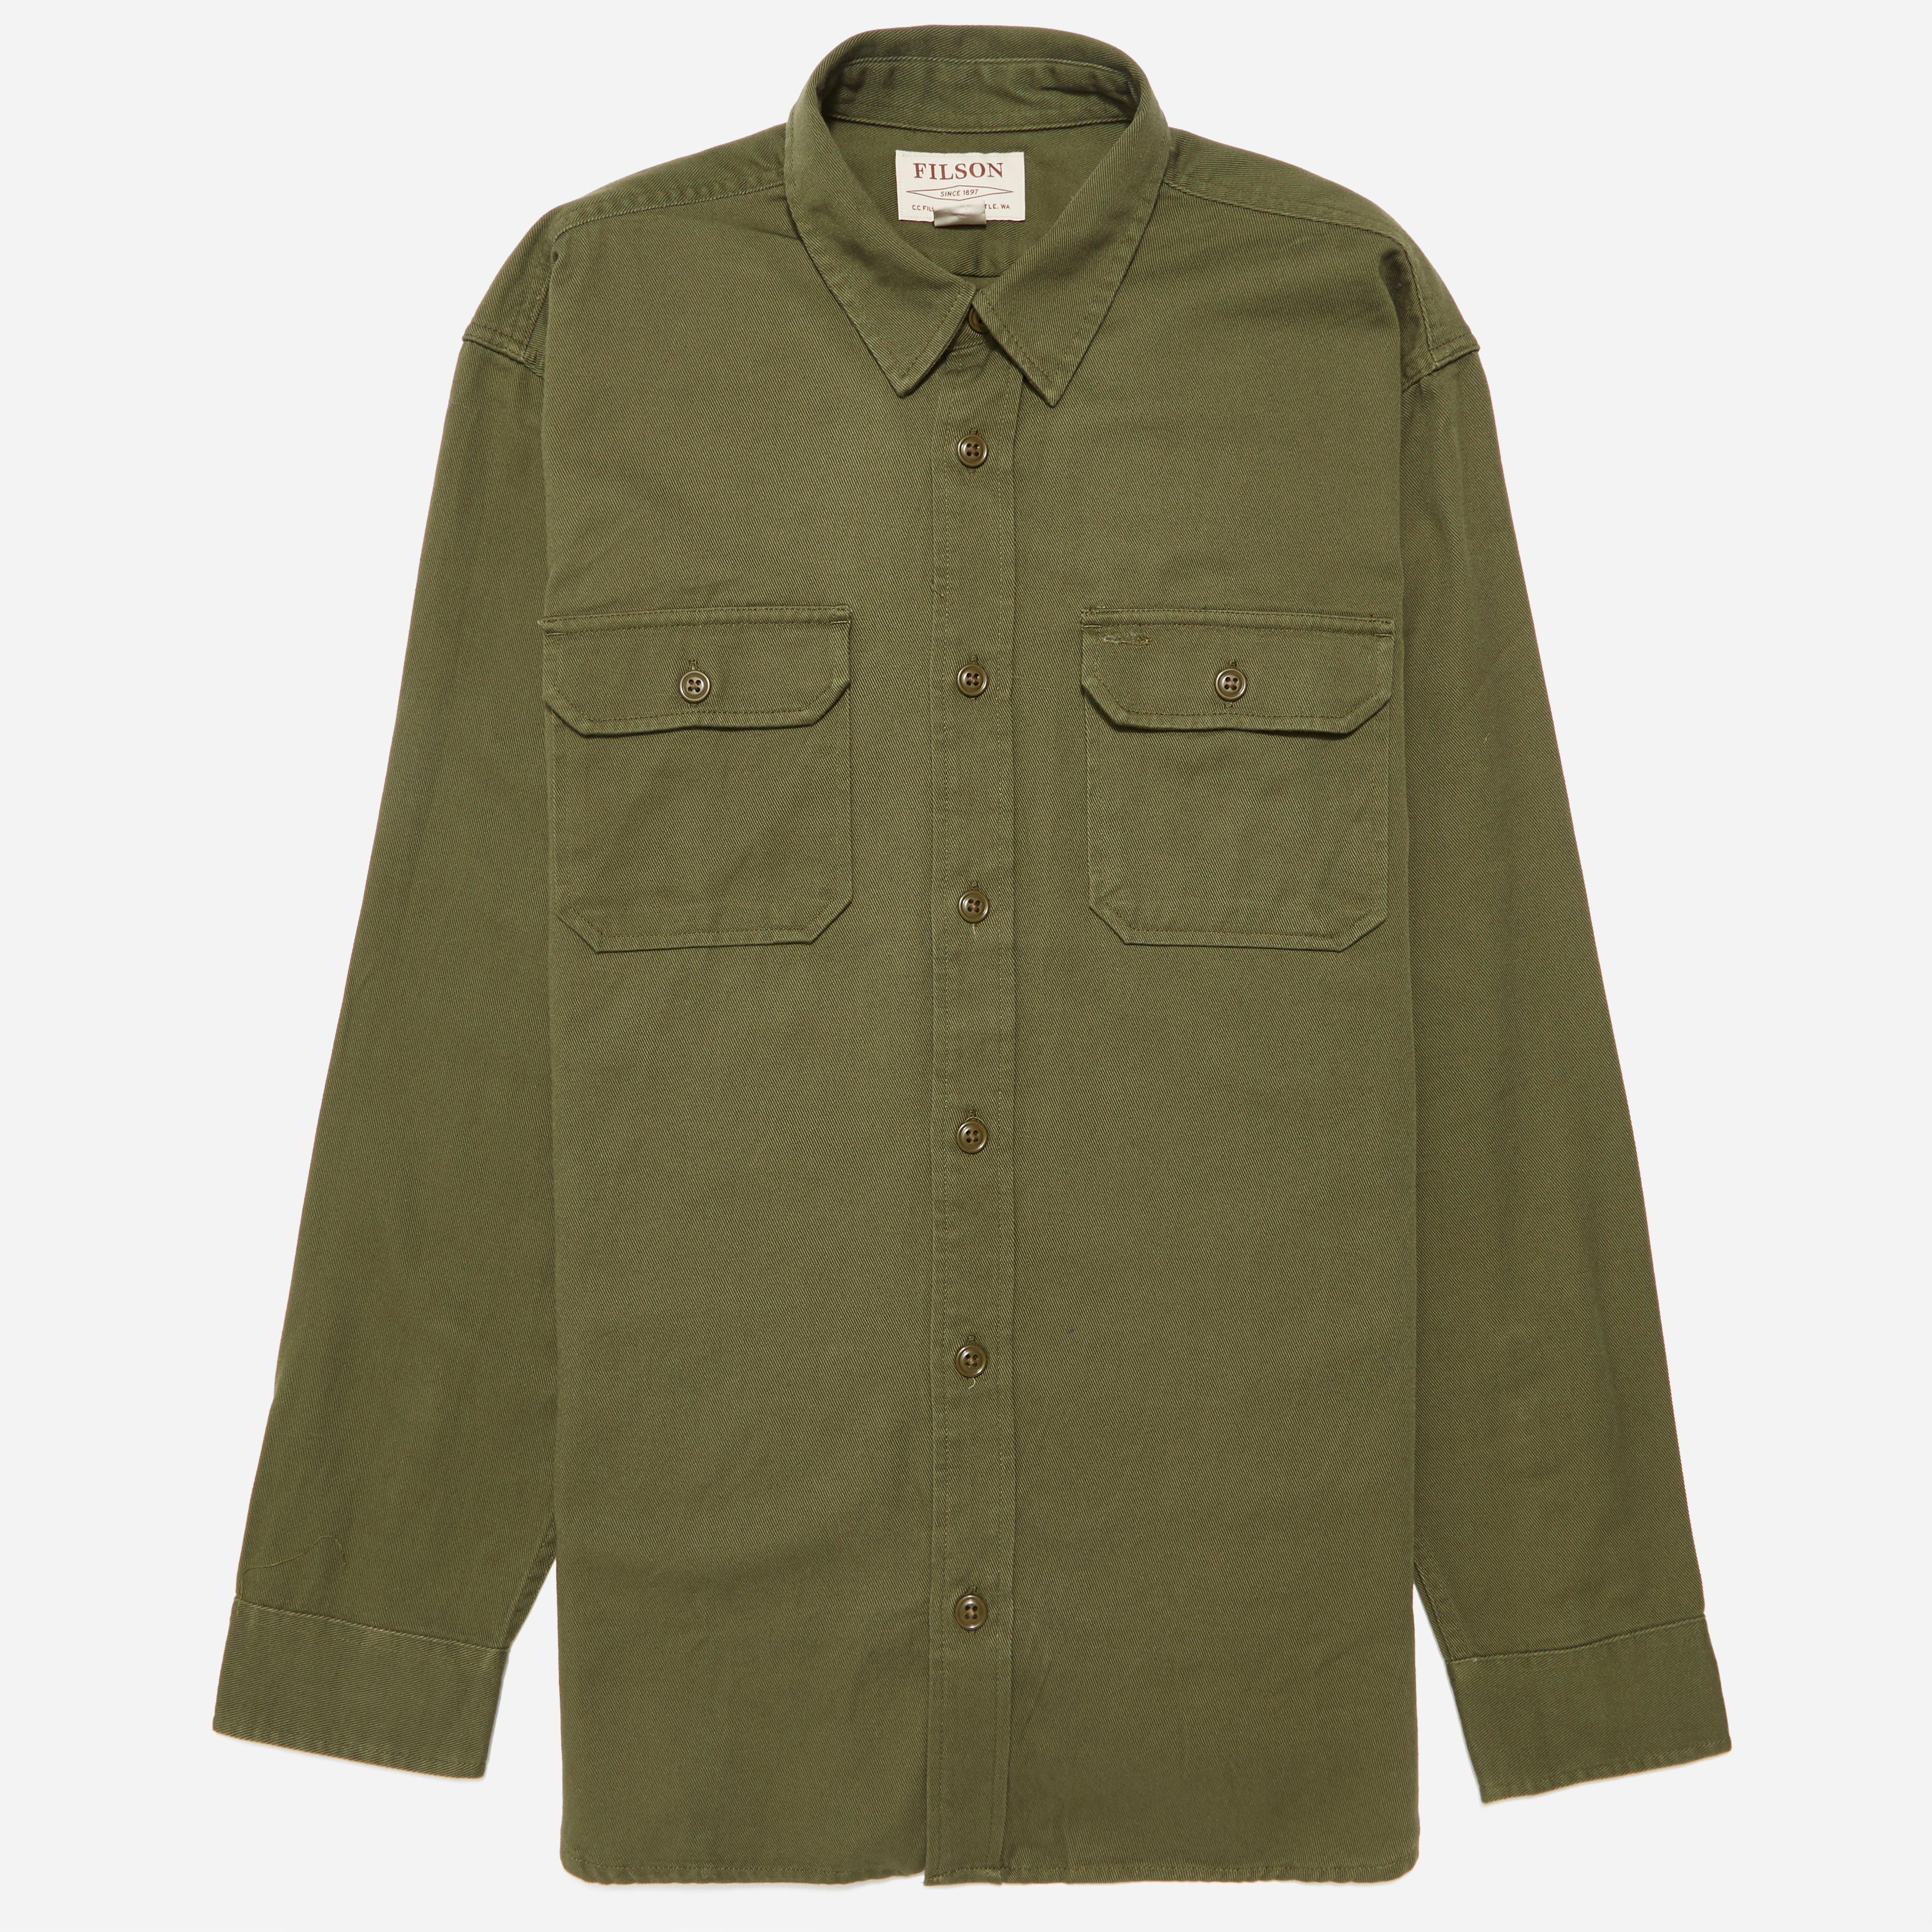 Filson 6oz Drill Chino Shirt